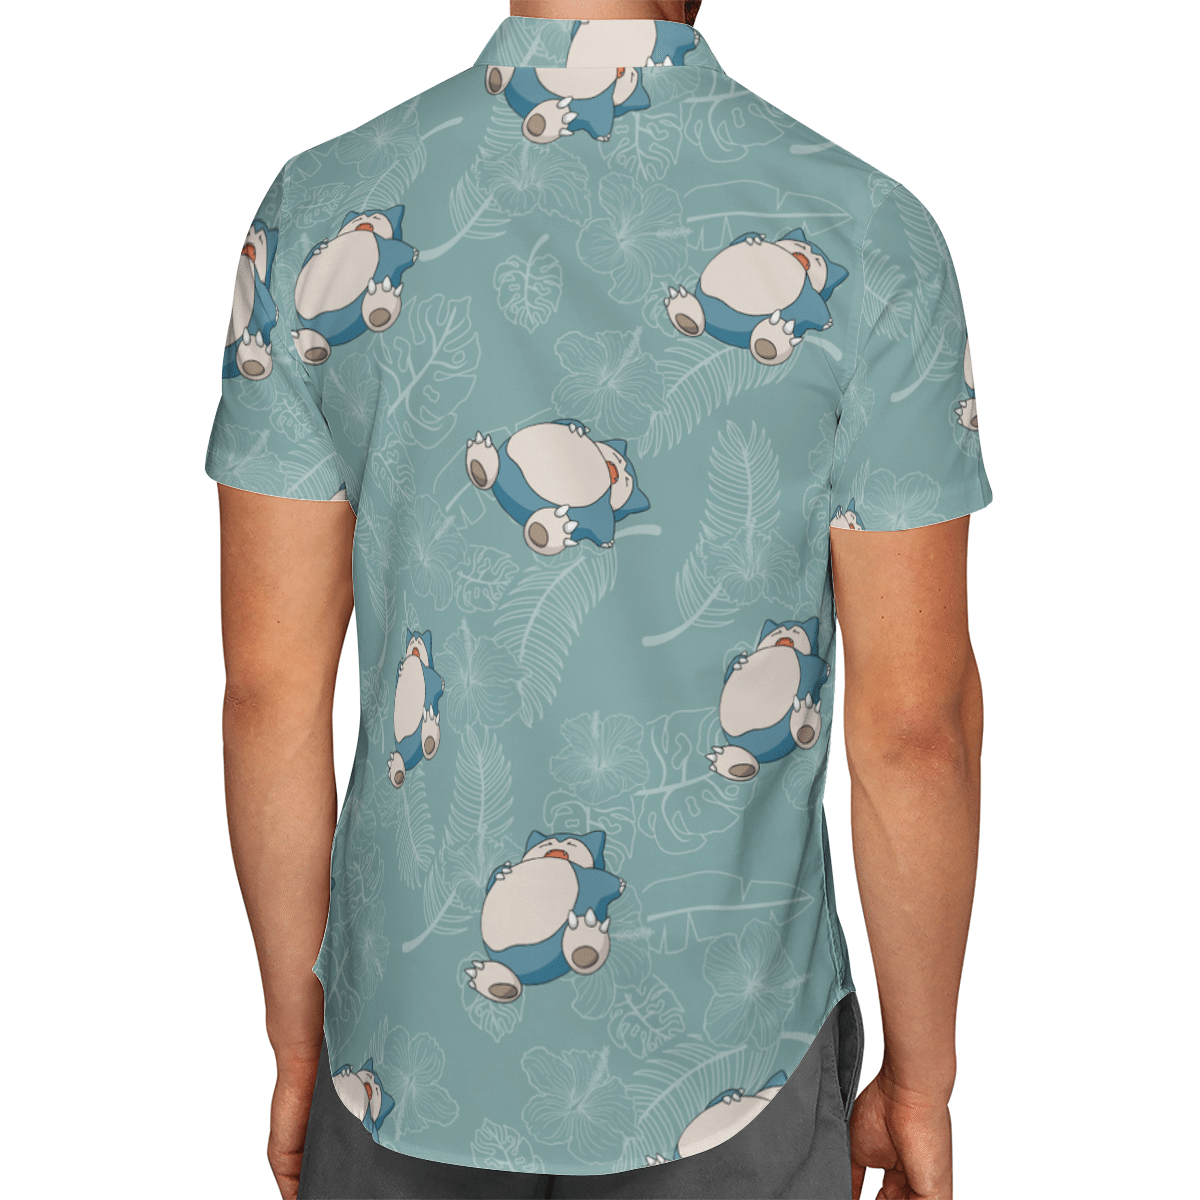 Snorlax hawaiian shirt - LIMITED EDITION